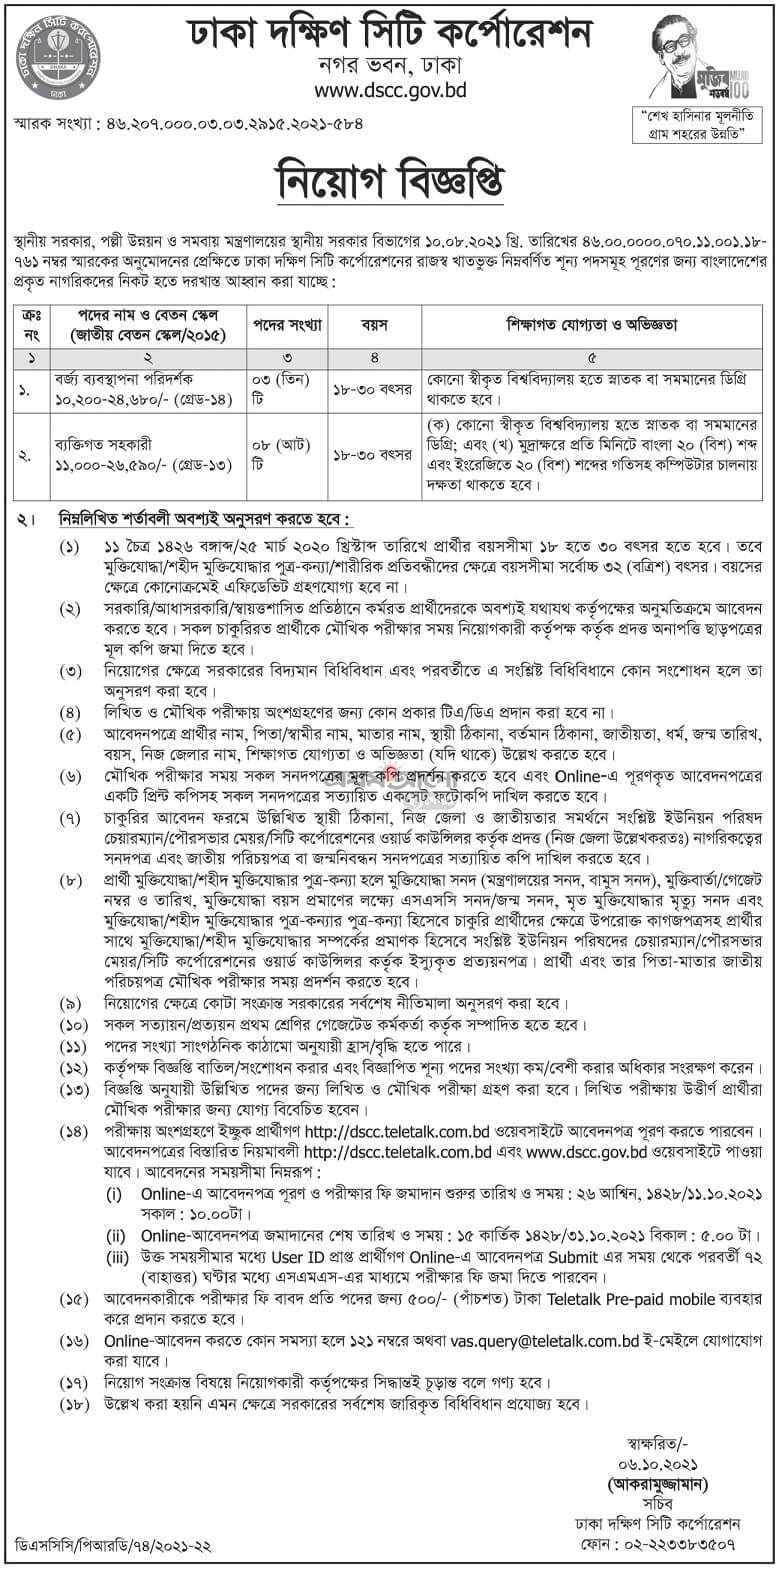 https://bdjobs24.net/wp-content/uploads/2021/10/Dhaka-South-City-Corporation-Job-Circular-2021.jpg